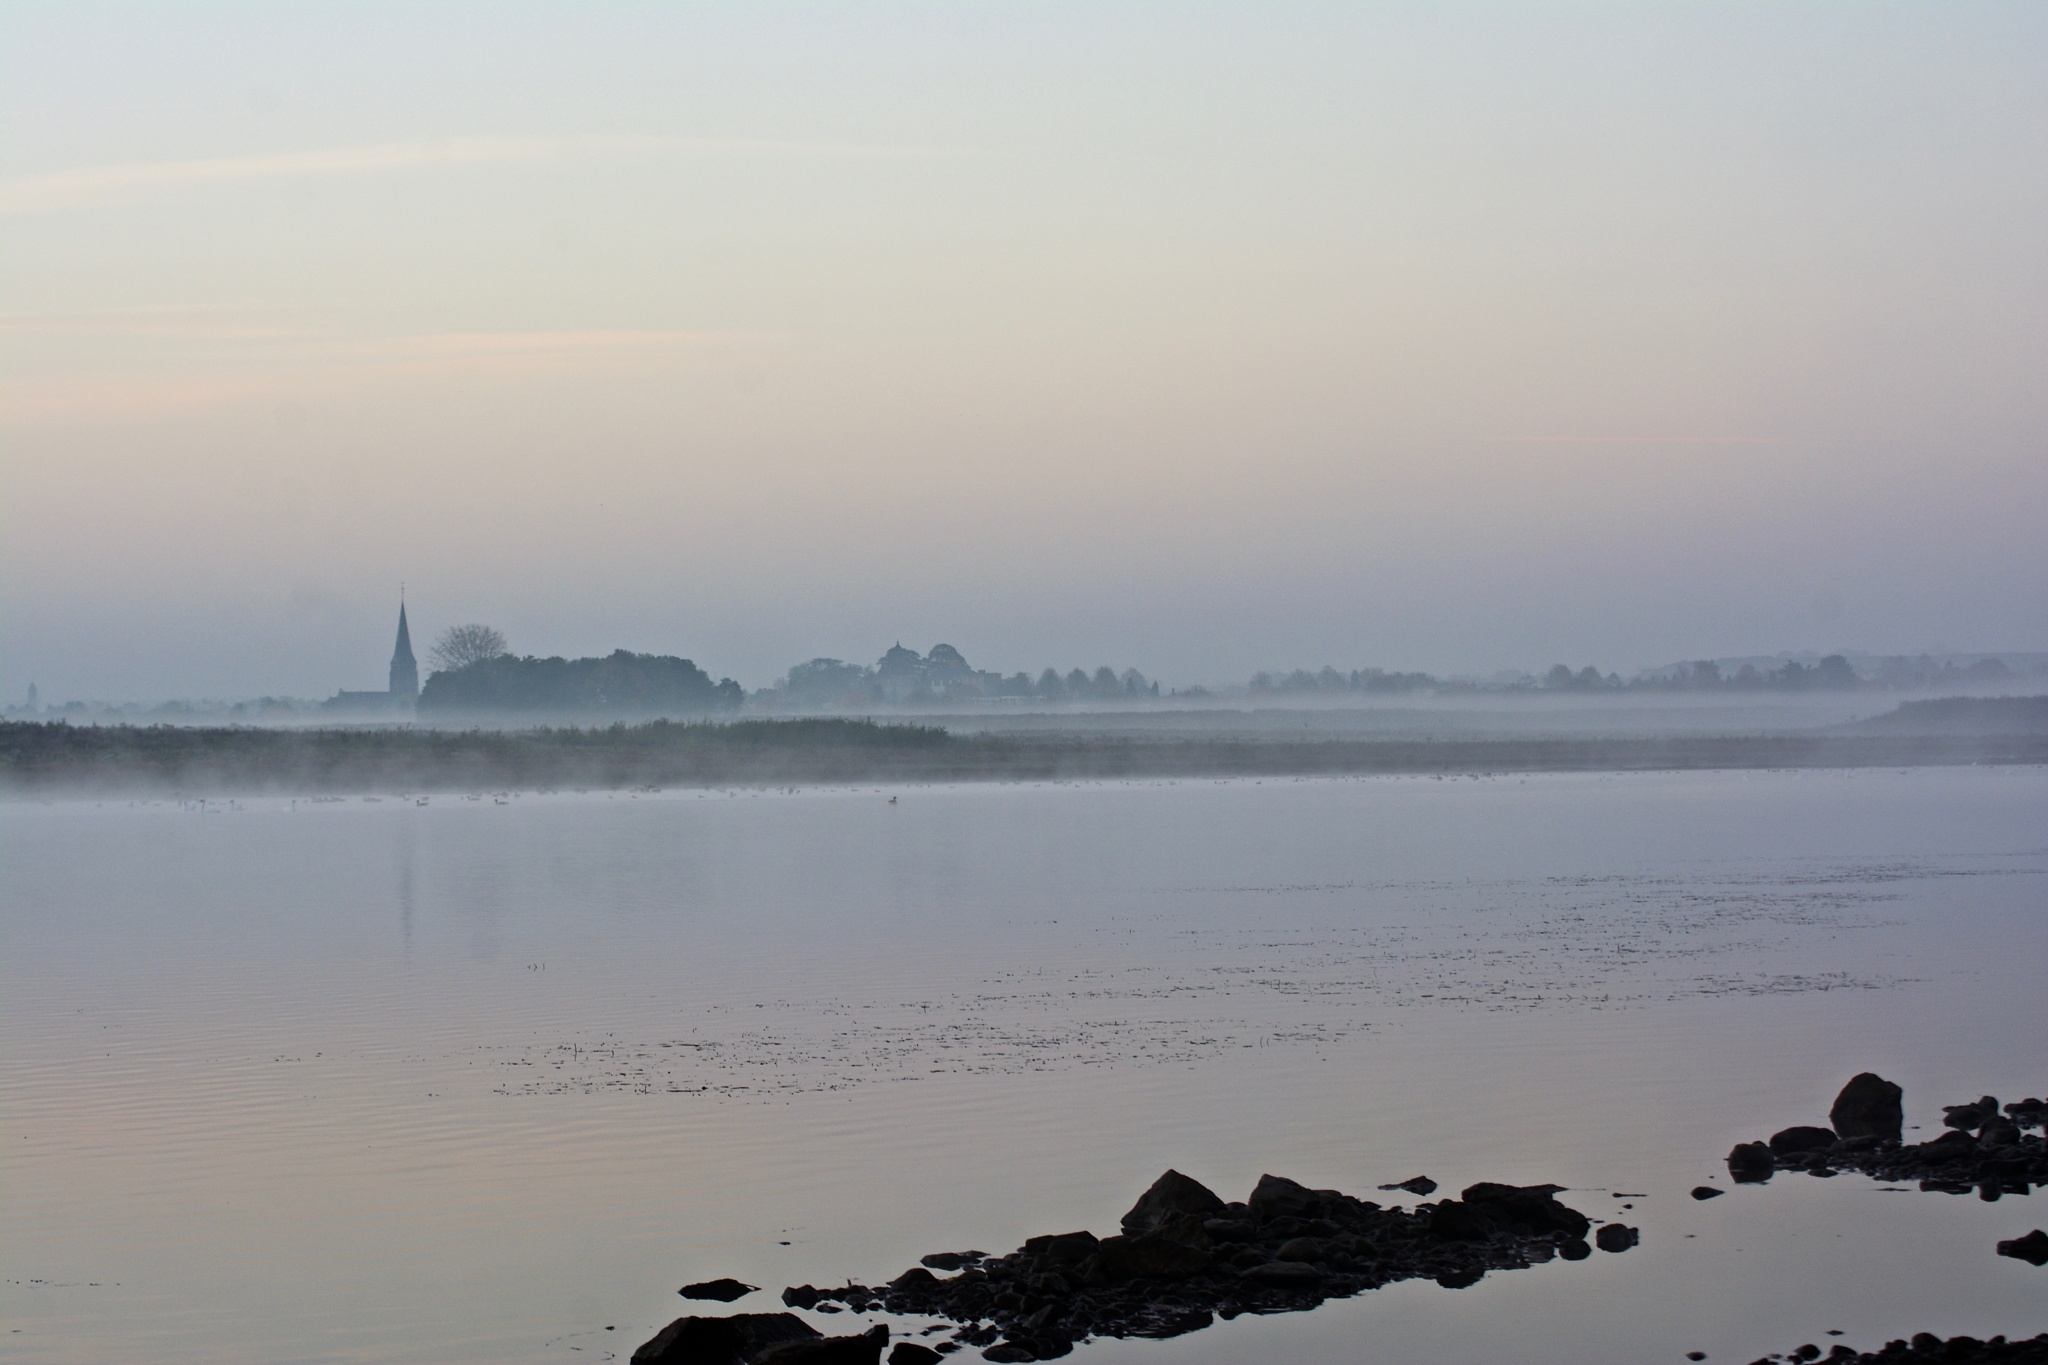 Misty mornin' by toinelenssen